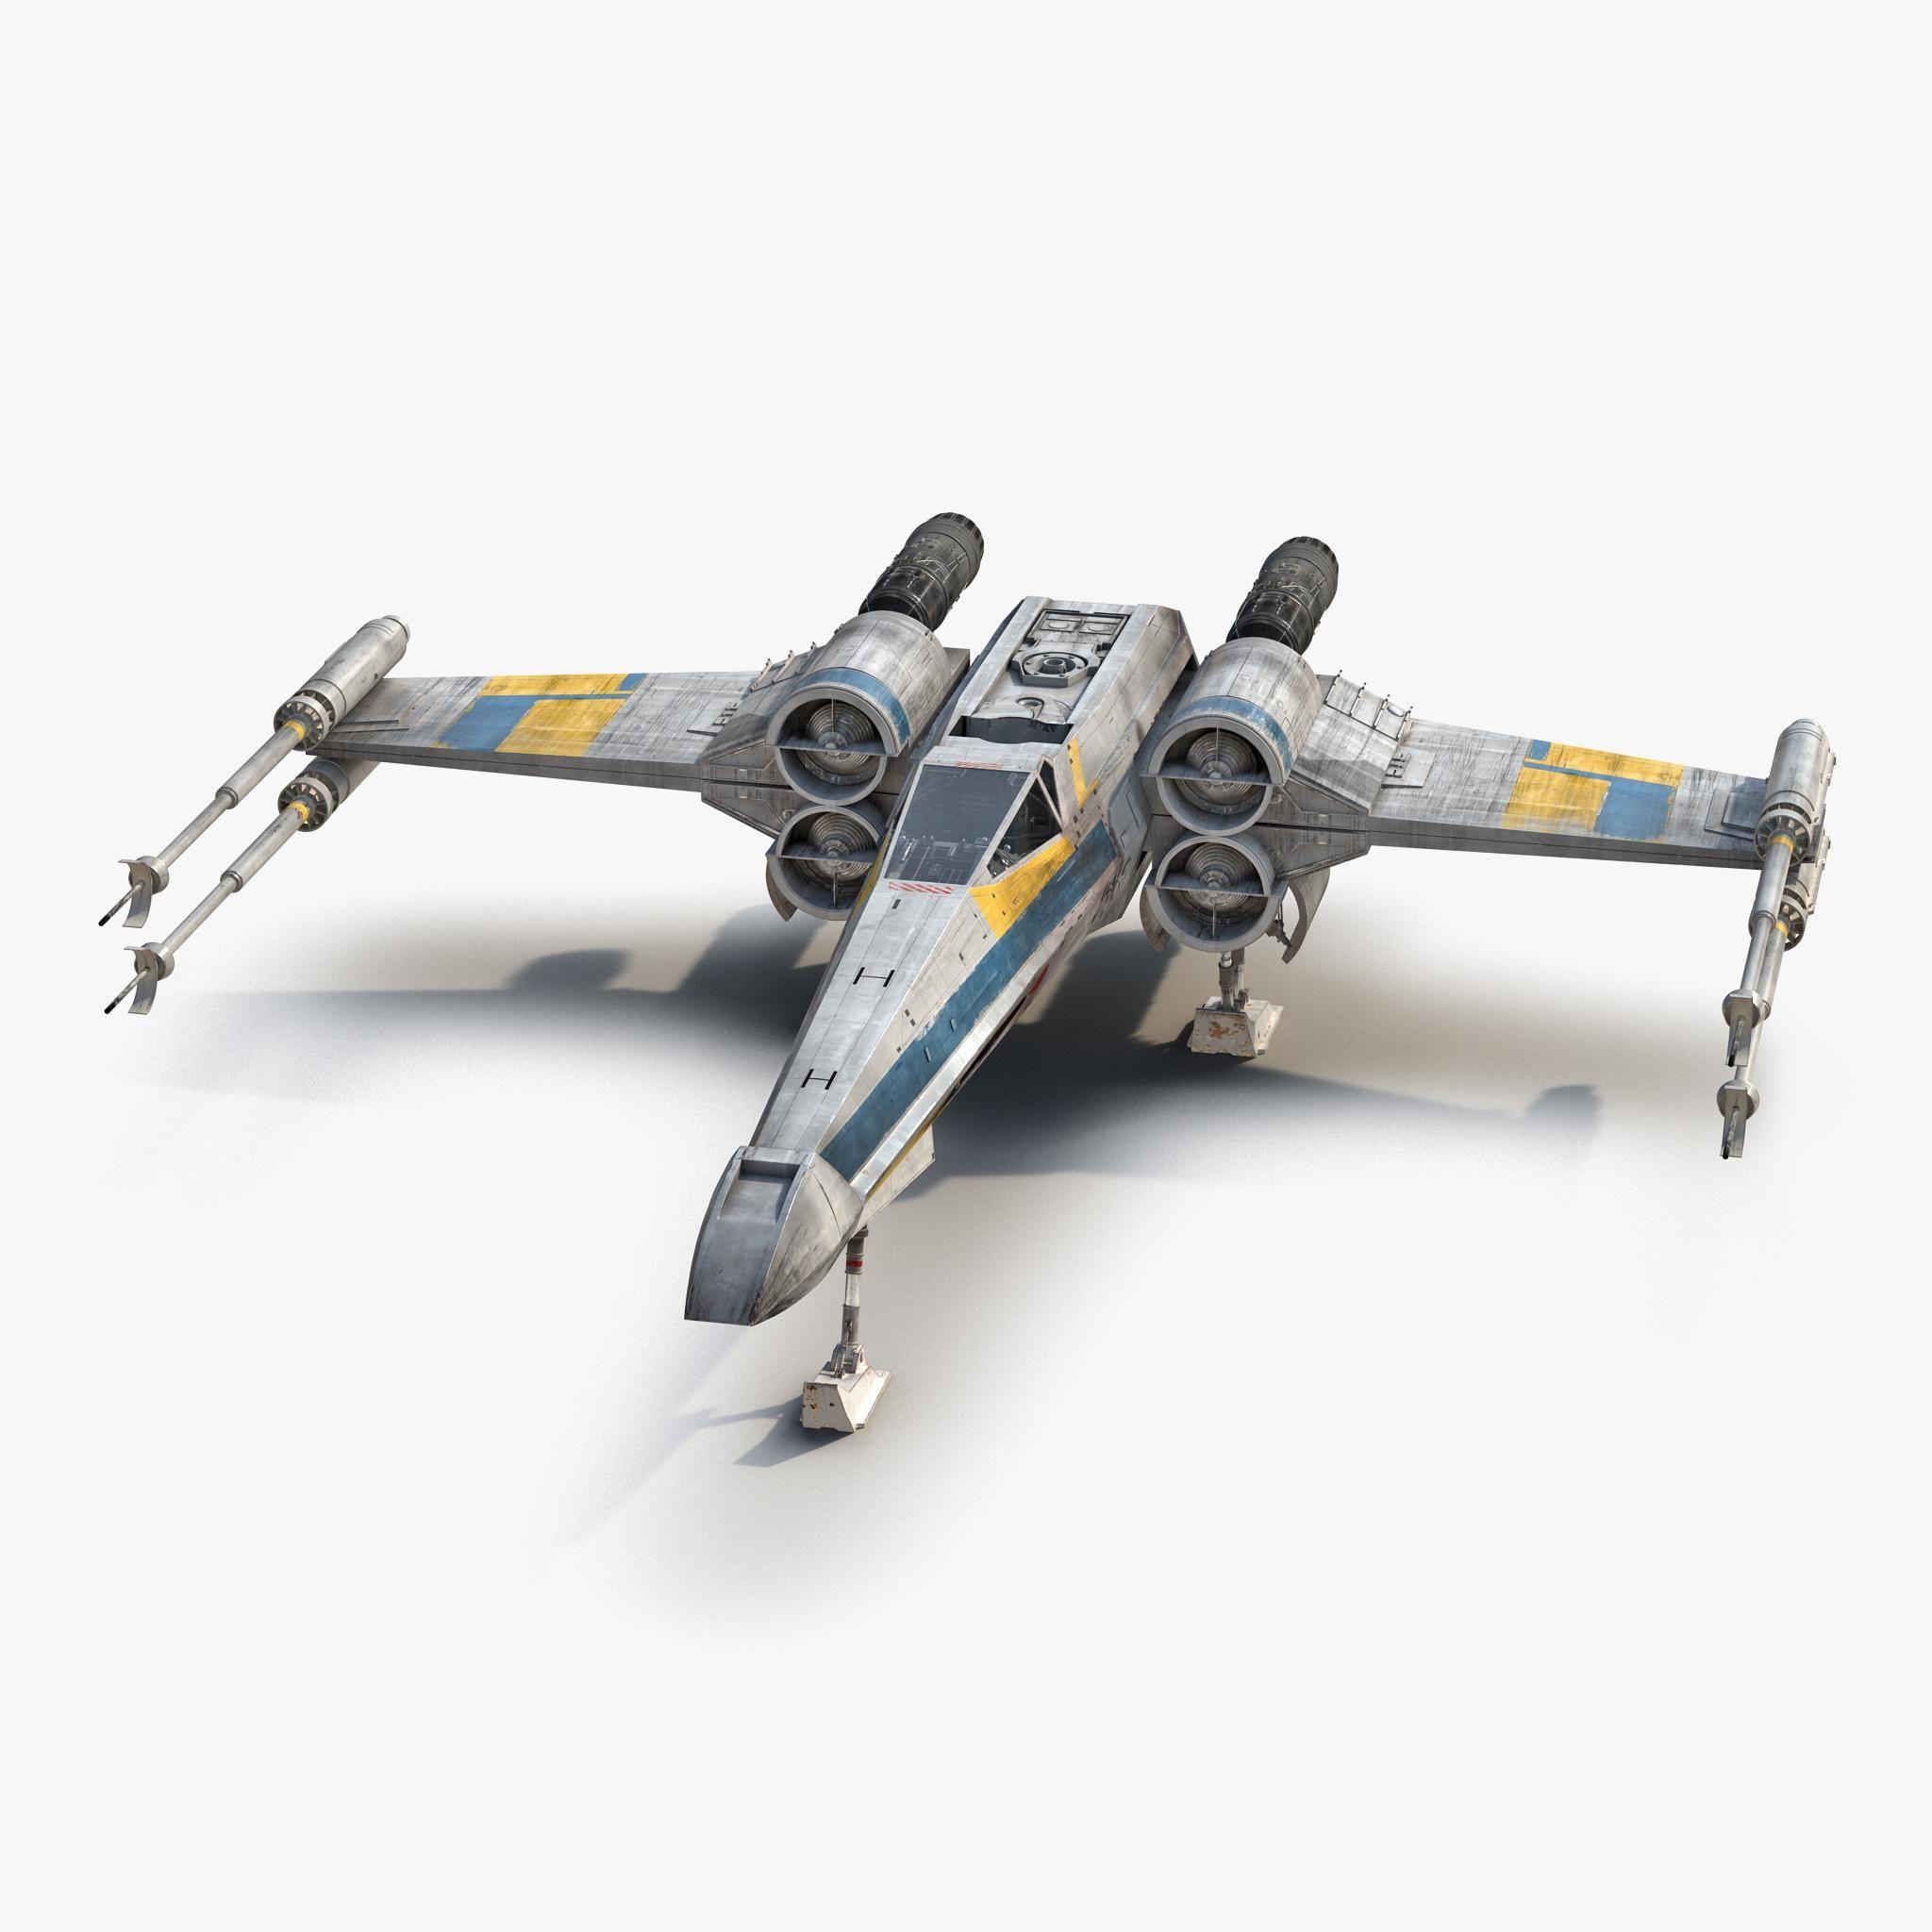 Star Wars X Wing Starfighter Blue 2 3d Model Ad Wing Wars Star Model Star Wars Models Star Wars Helmet Star Wars Ships